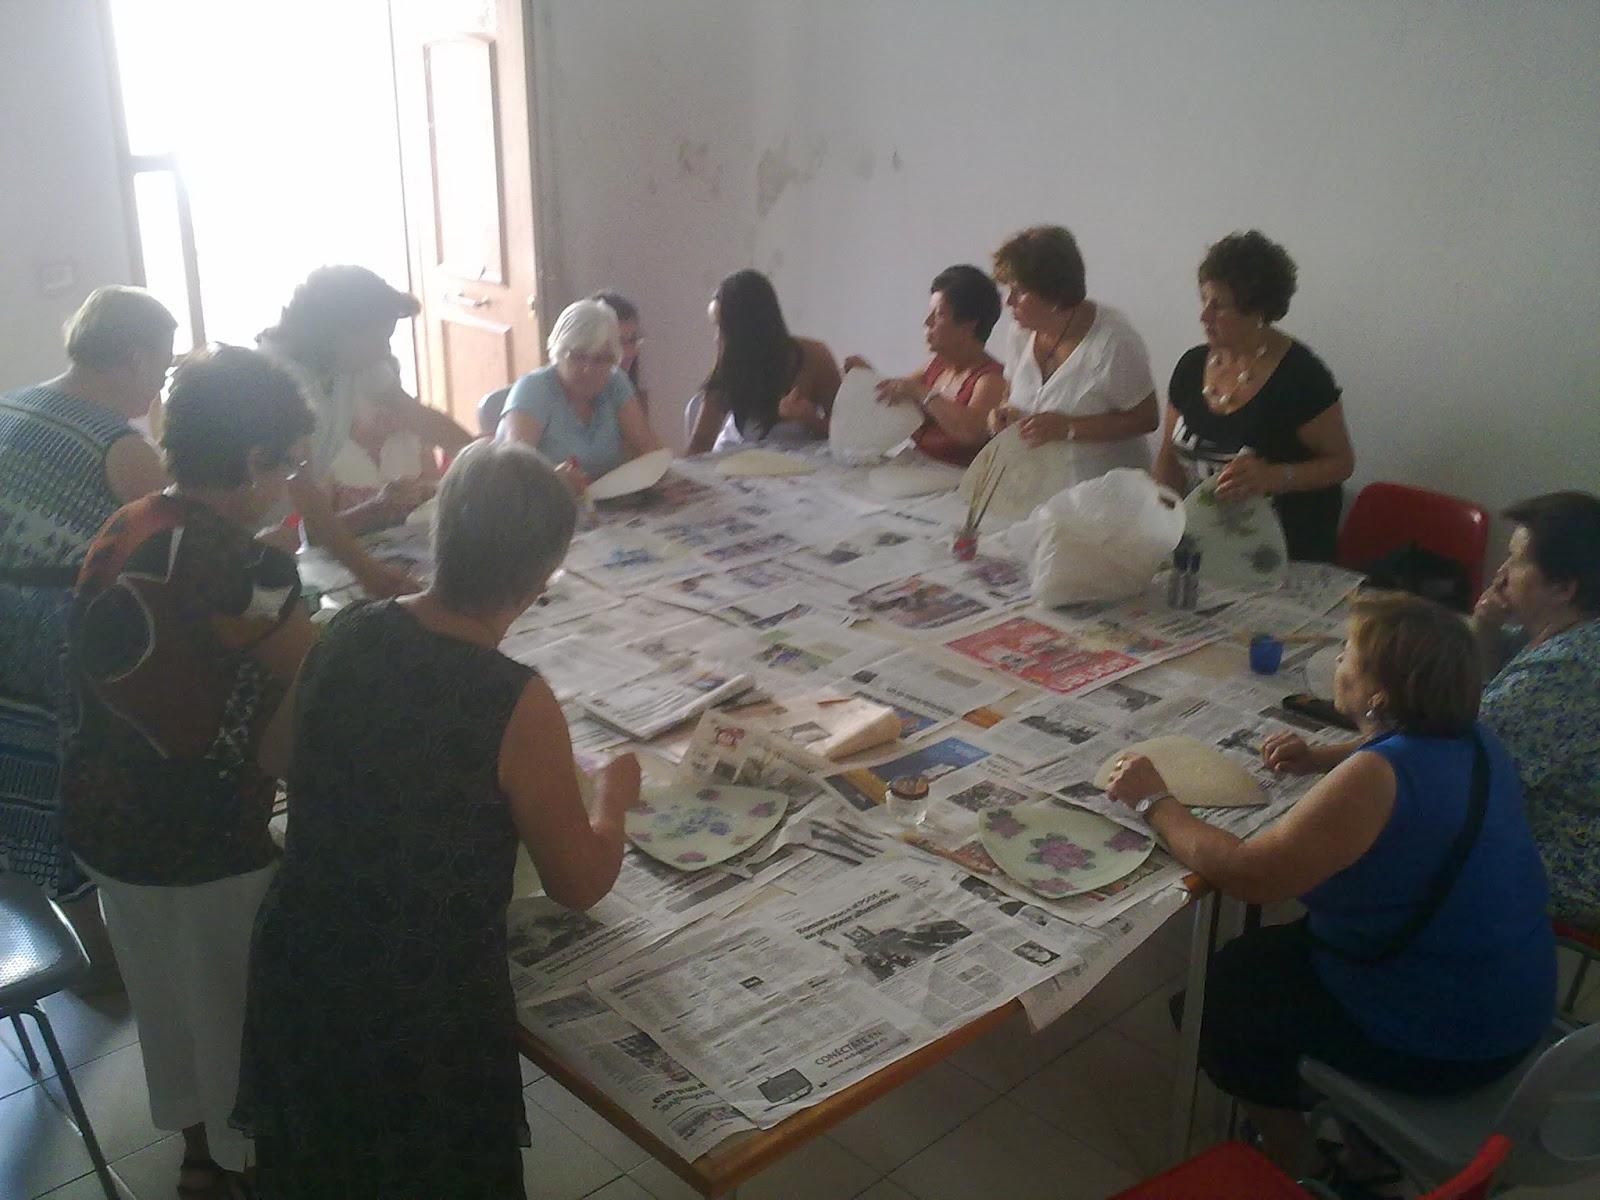 Asociaci n cultural pe a de la mora taller de - Manualidades originales para adultos ...